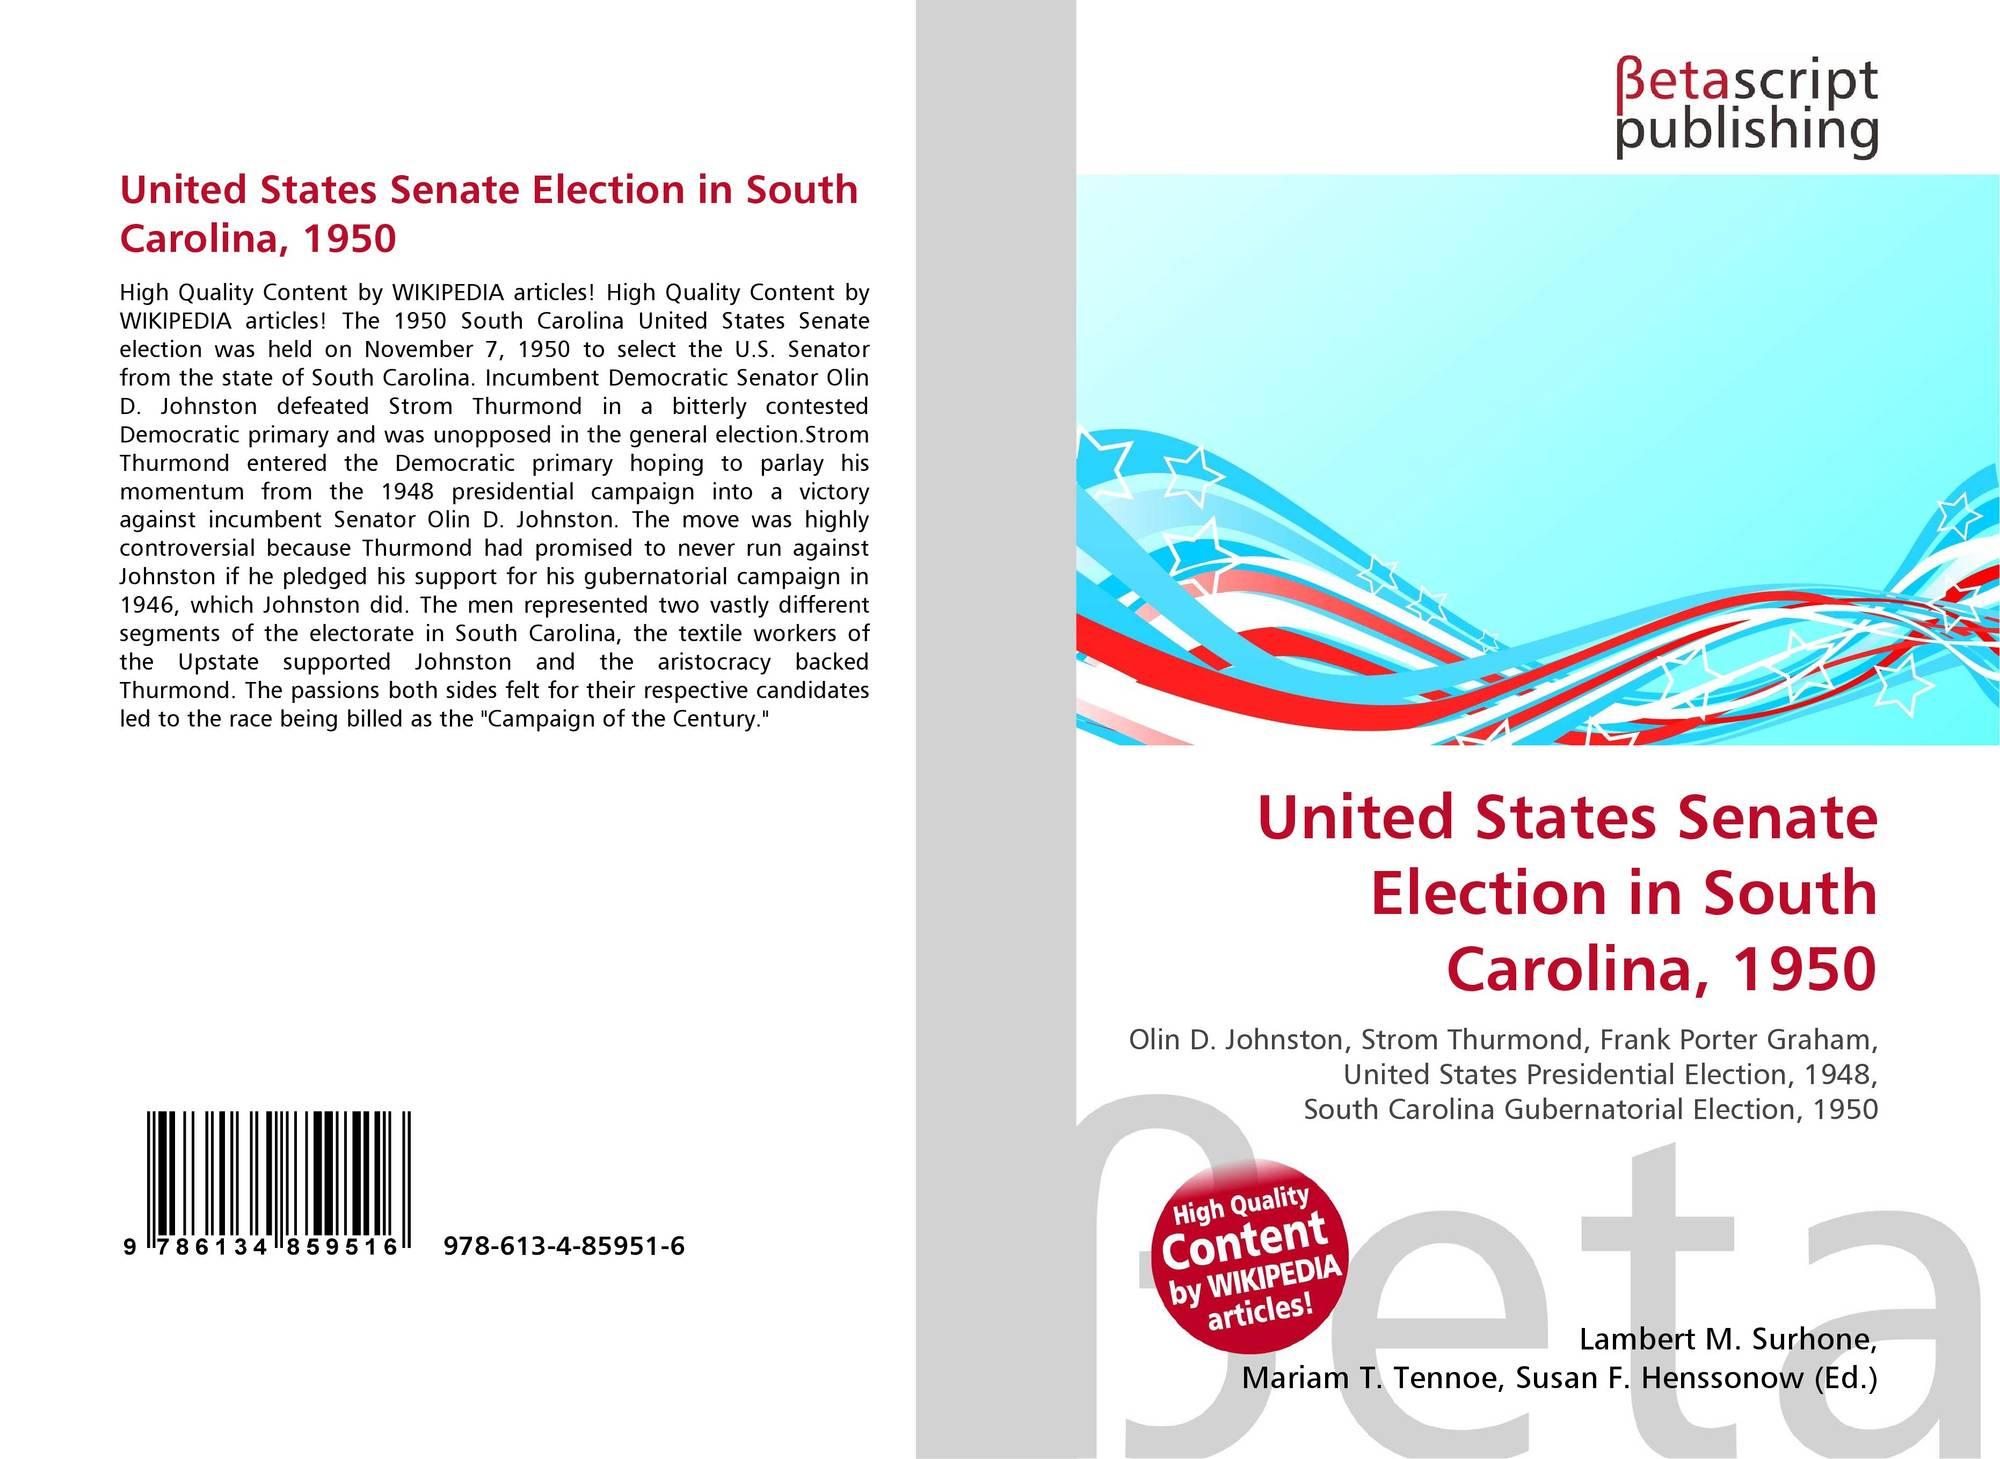 1950 United States Senate election in South Carolina